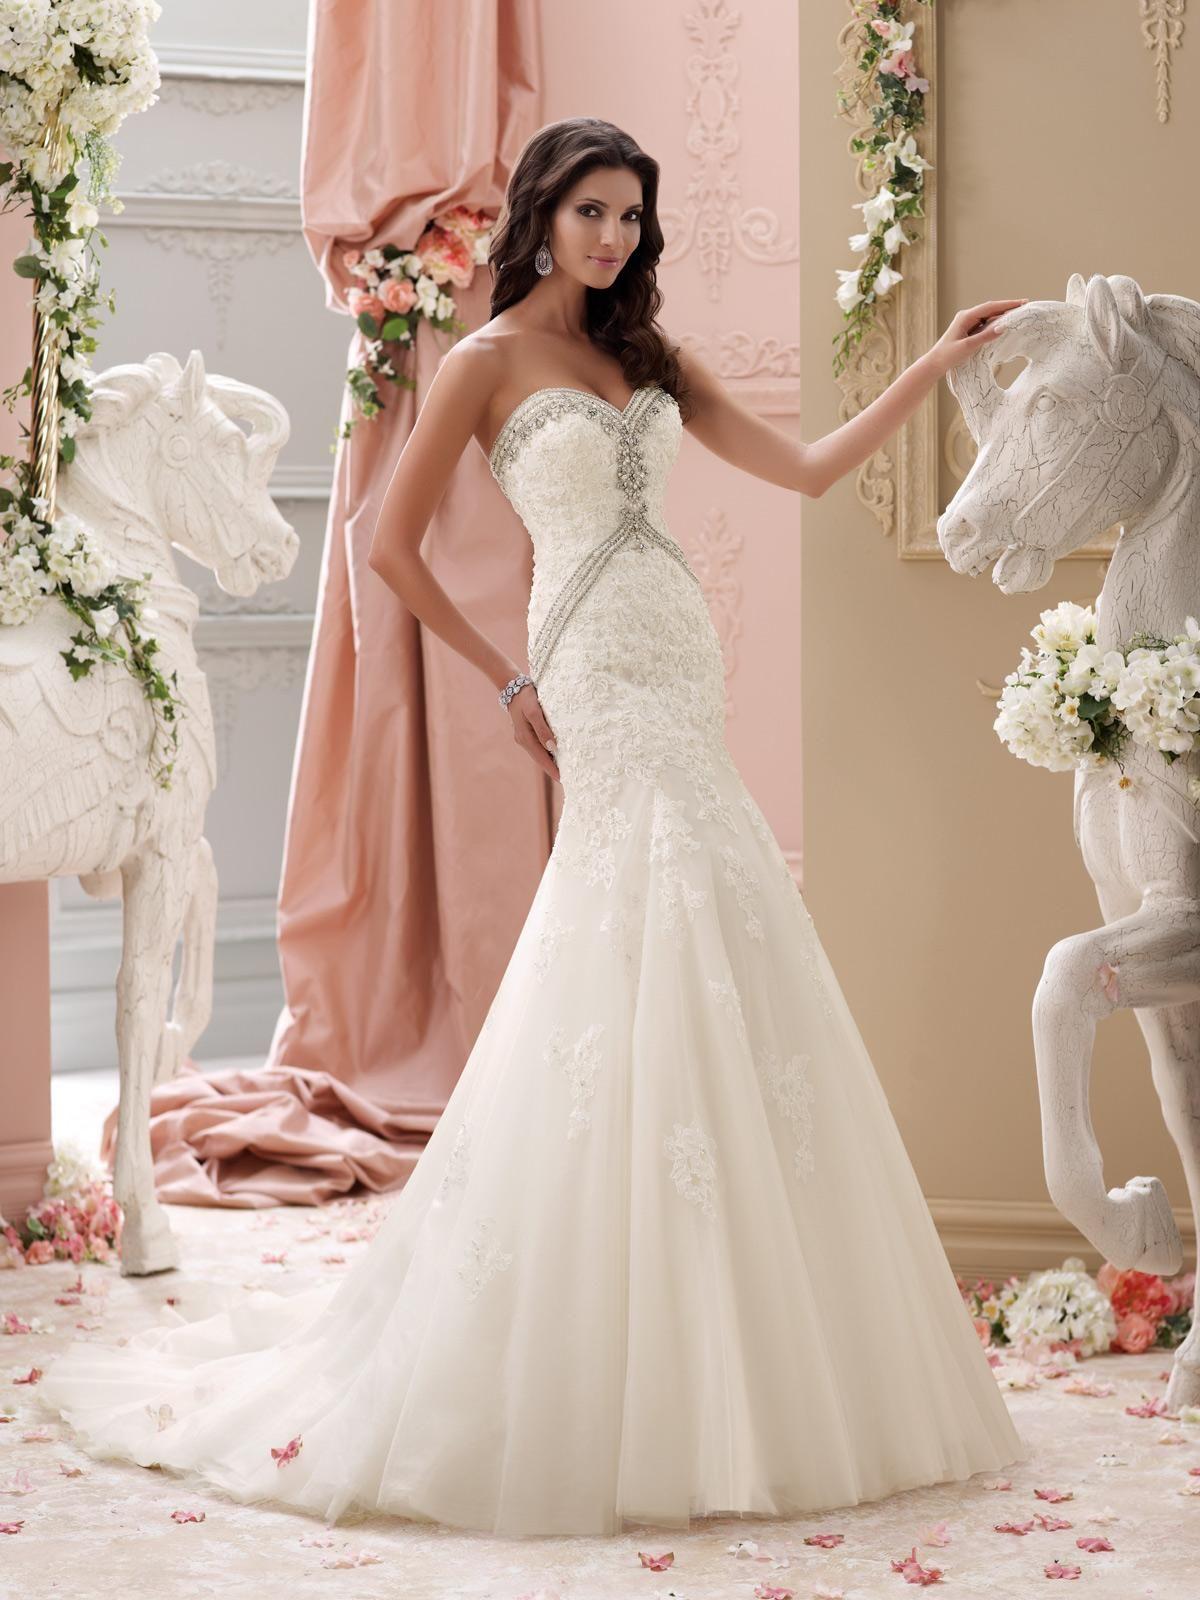 strapless-sweetheart-basque-wedding-dress | Alluring Basque Wedding ...